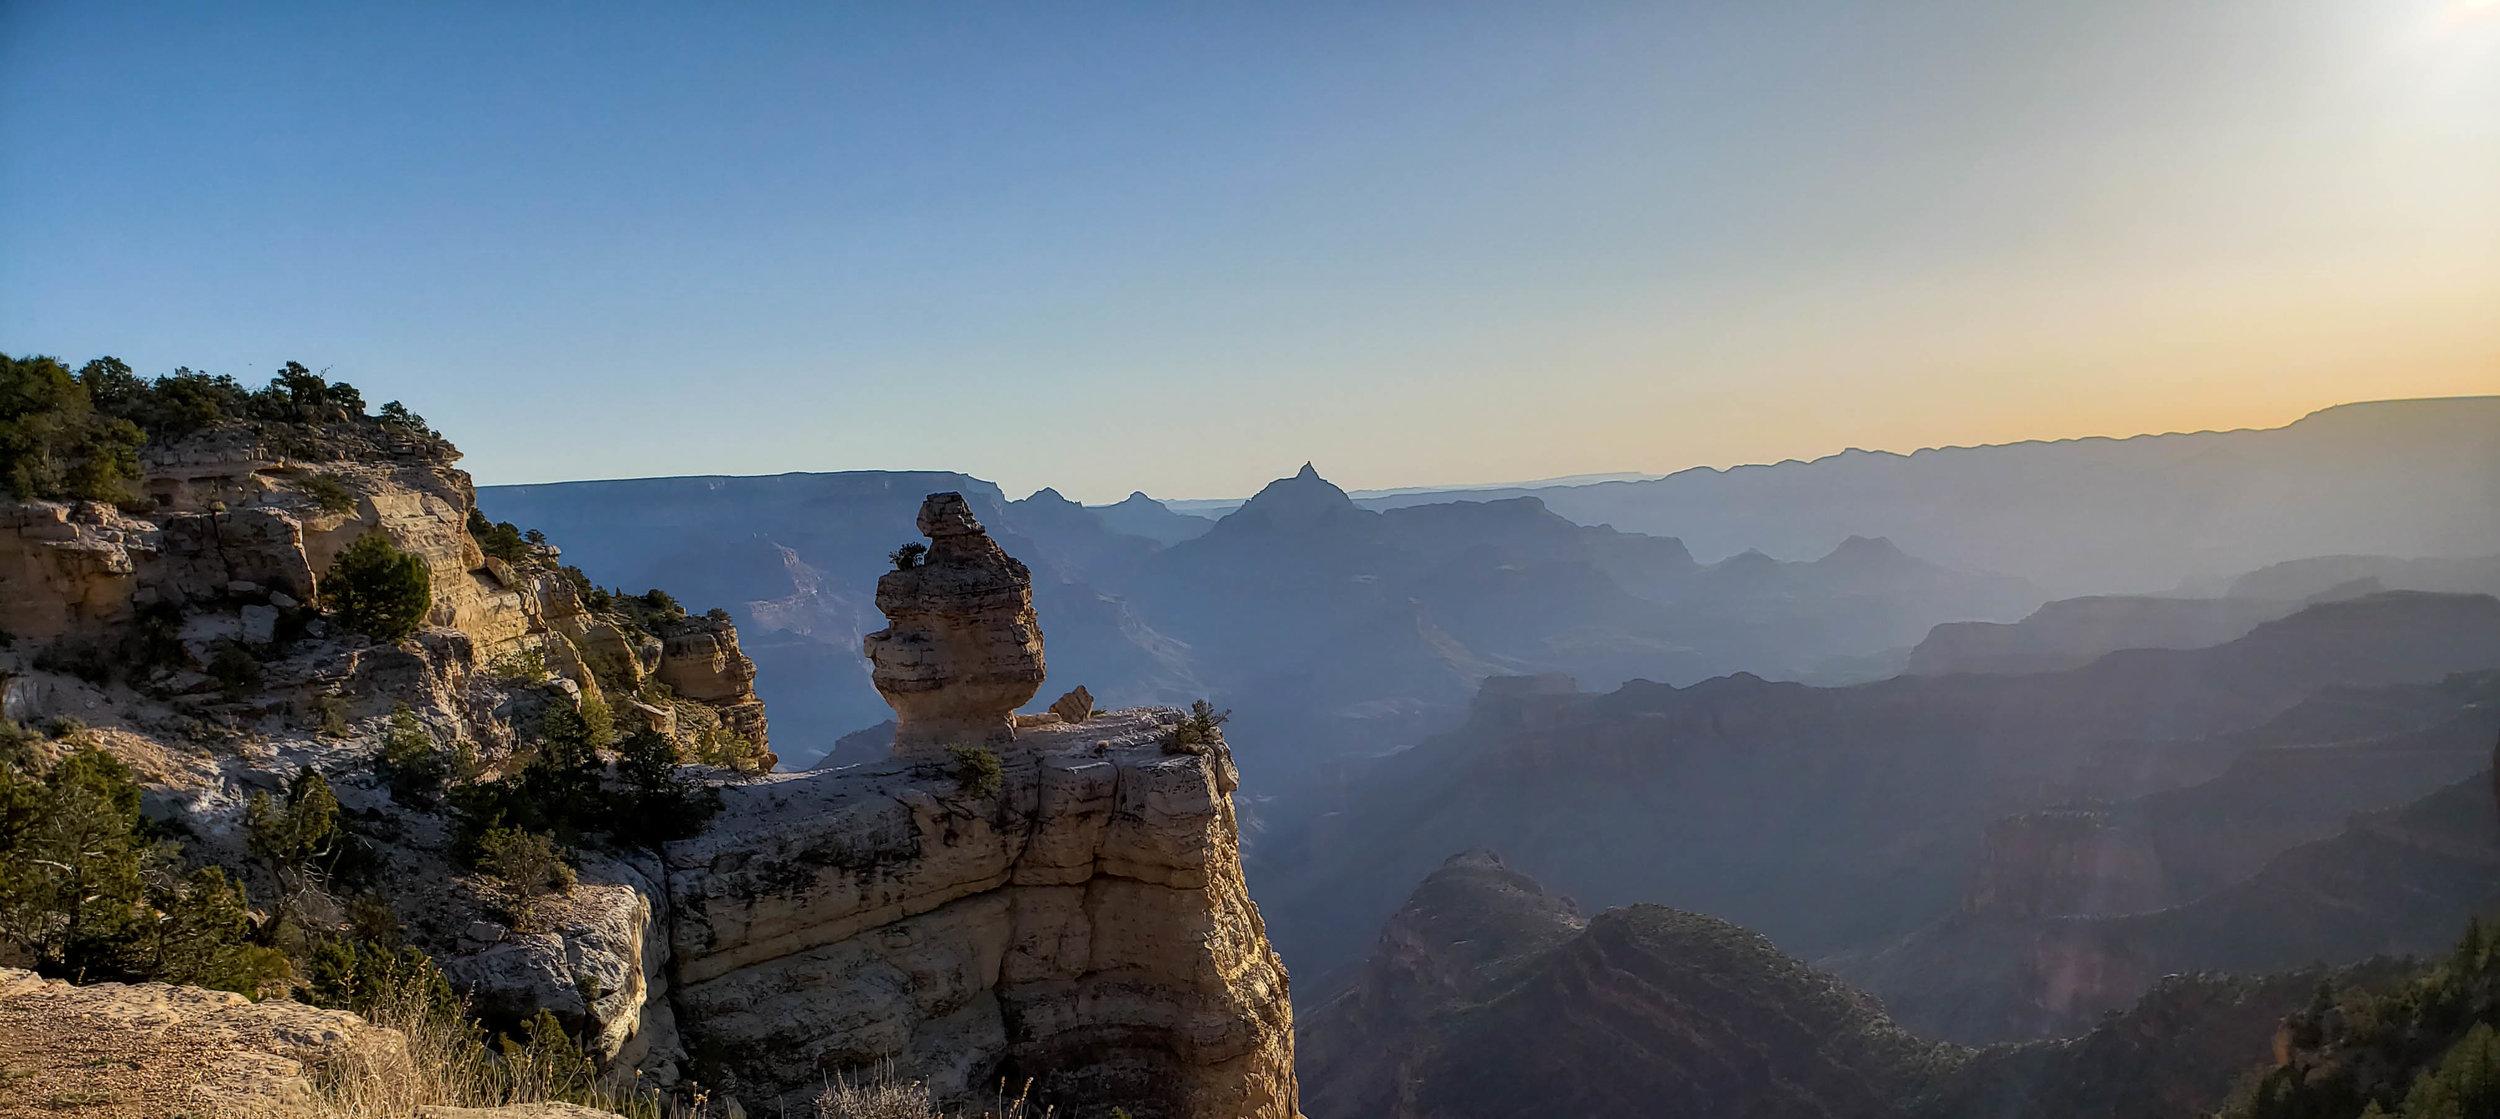 Blind Spot Creatives - Grand Canyon Sunrise